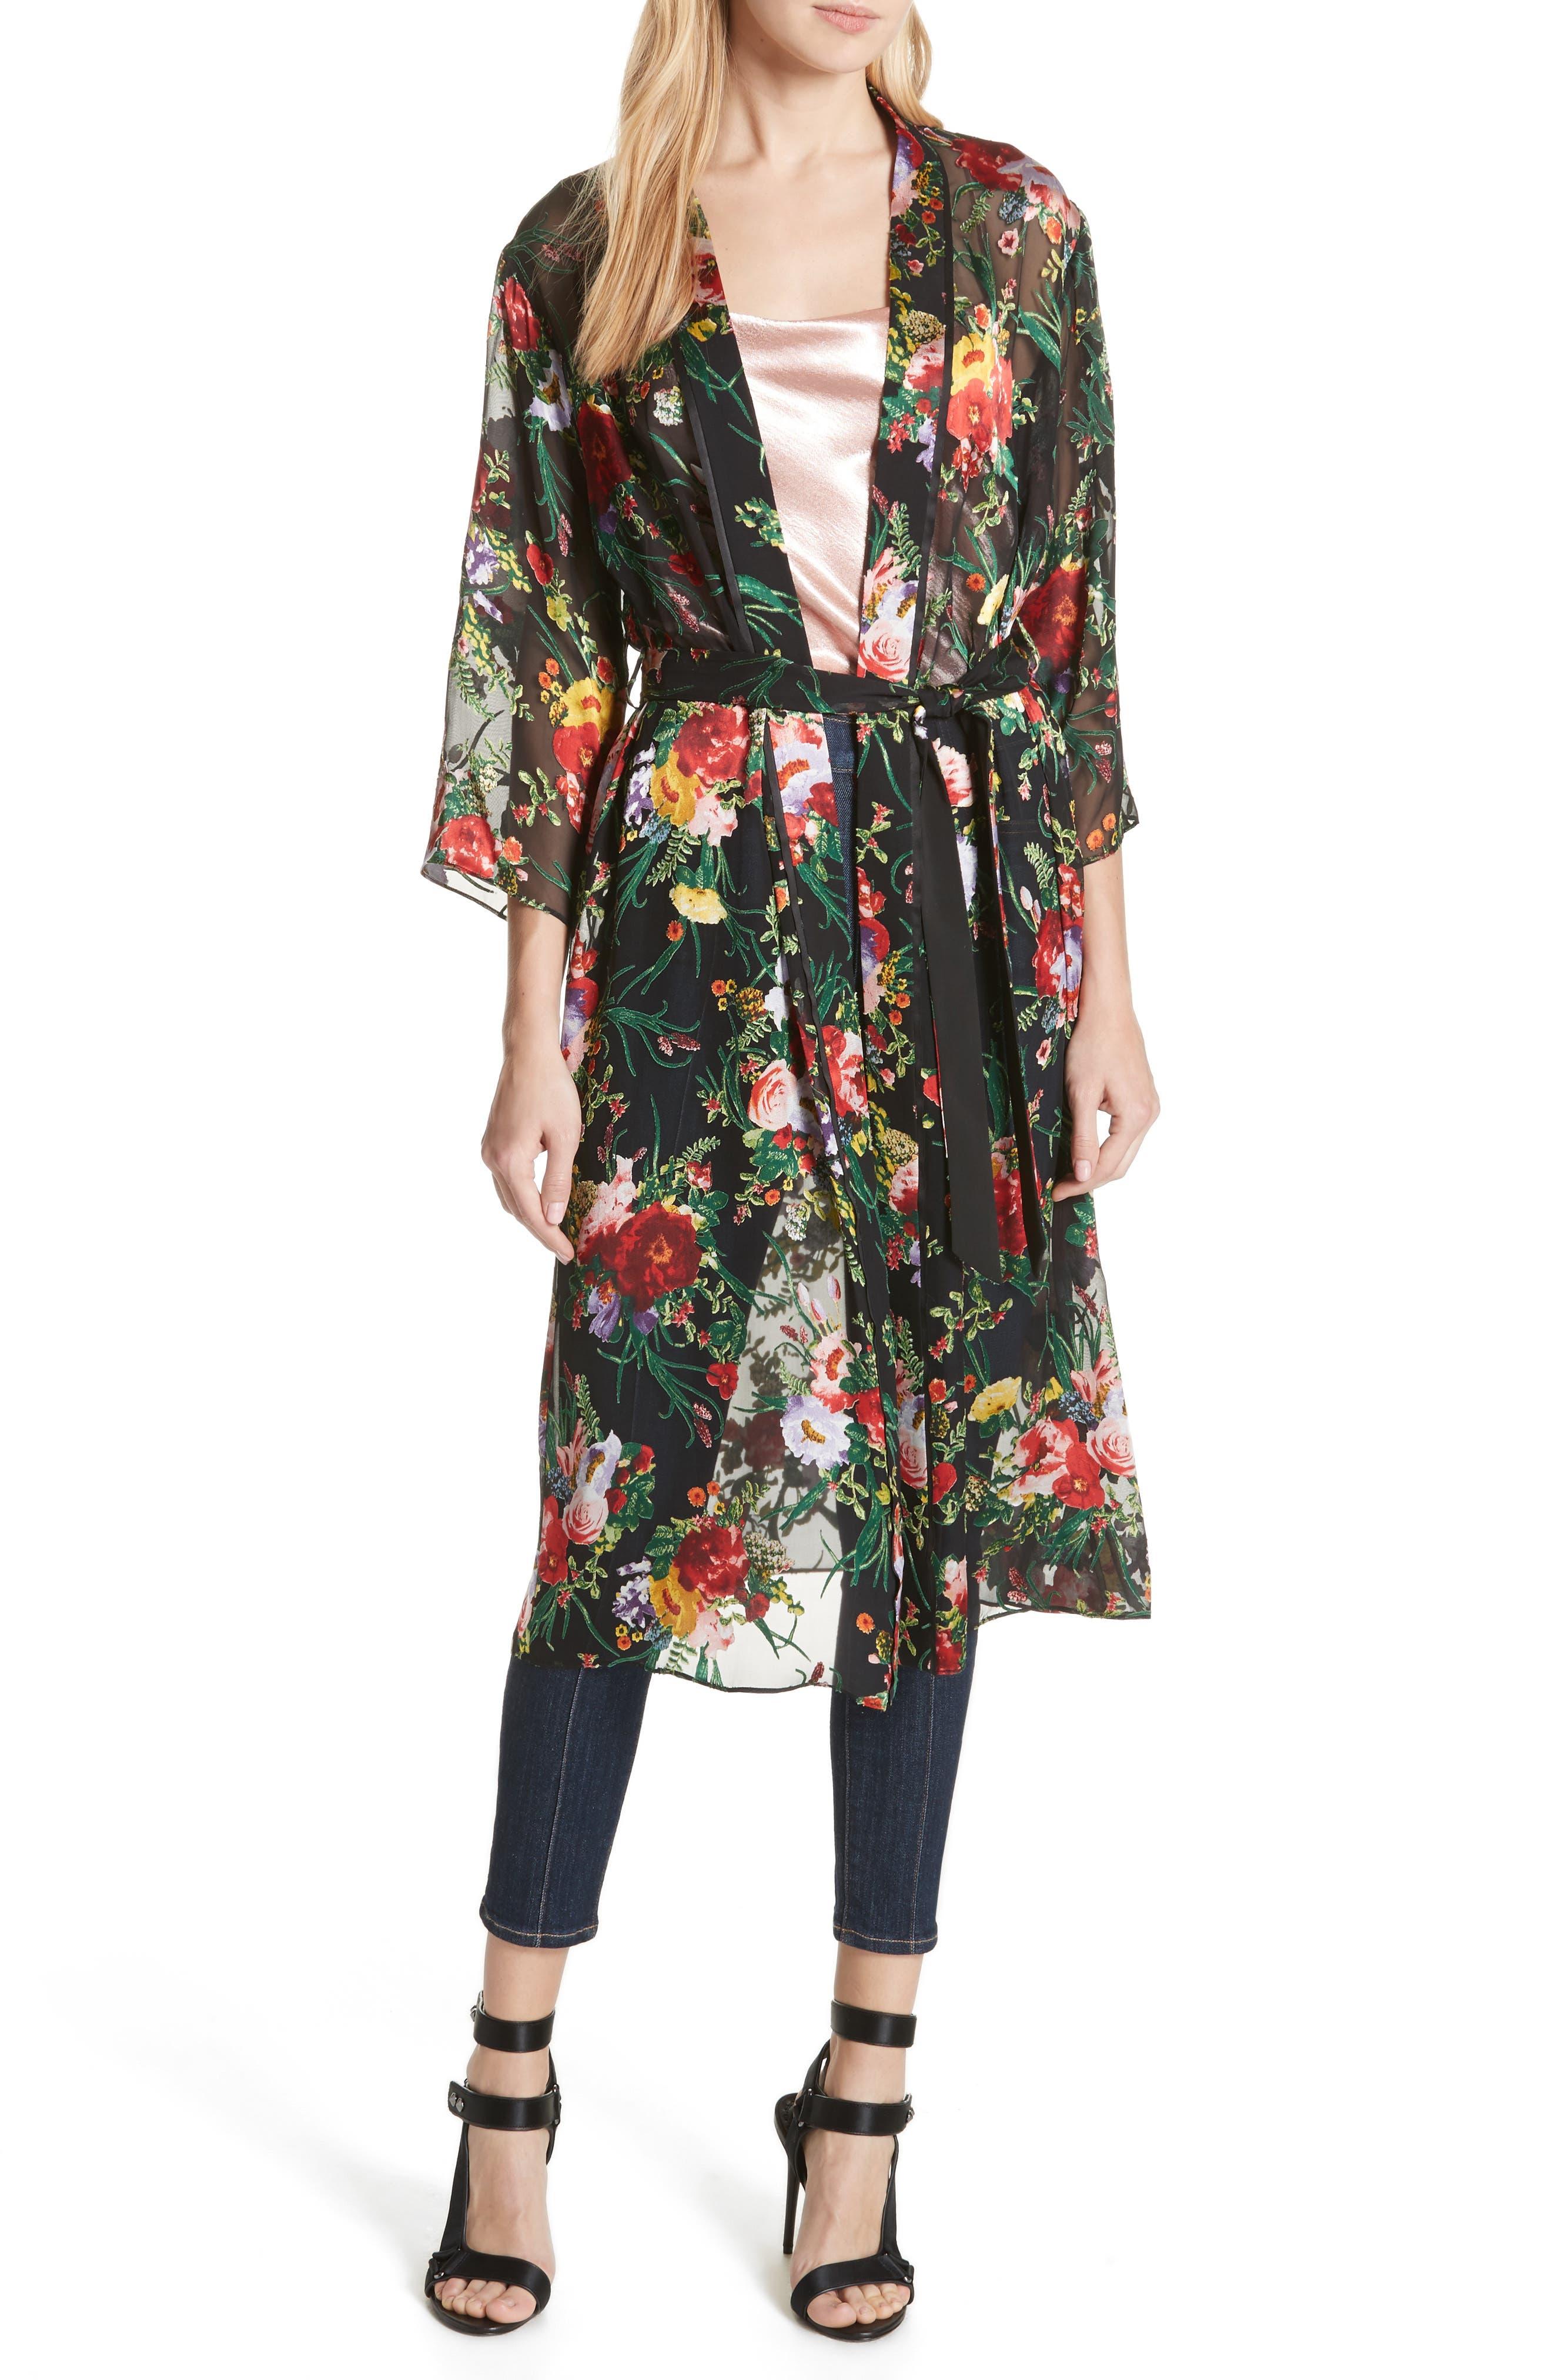 Alice + Olivia A+O Floral Robe Jacket